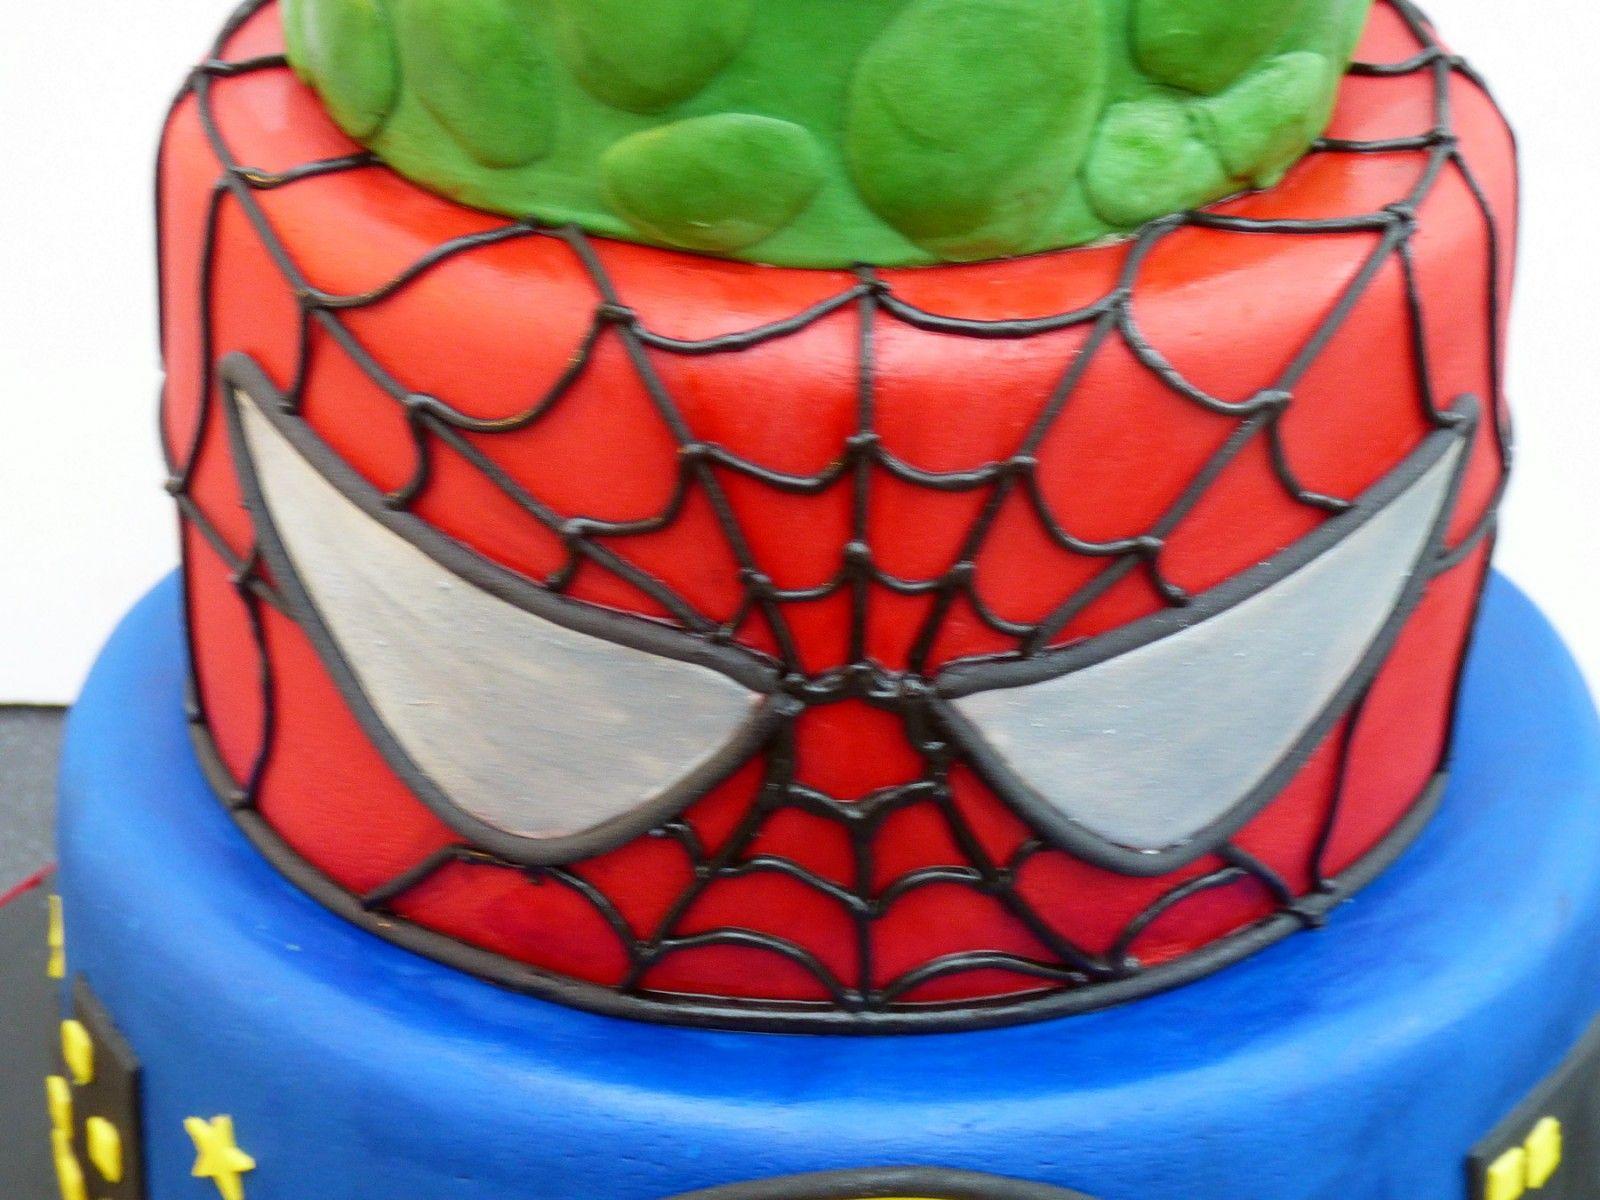 Marvel Super Heroes Cake Batman Spiderman Incredible Hulk Birthday